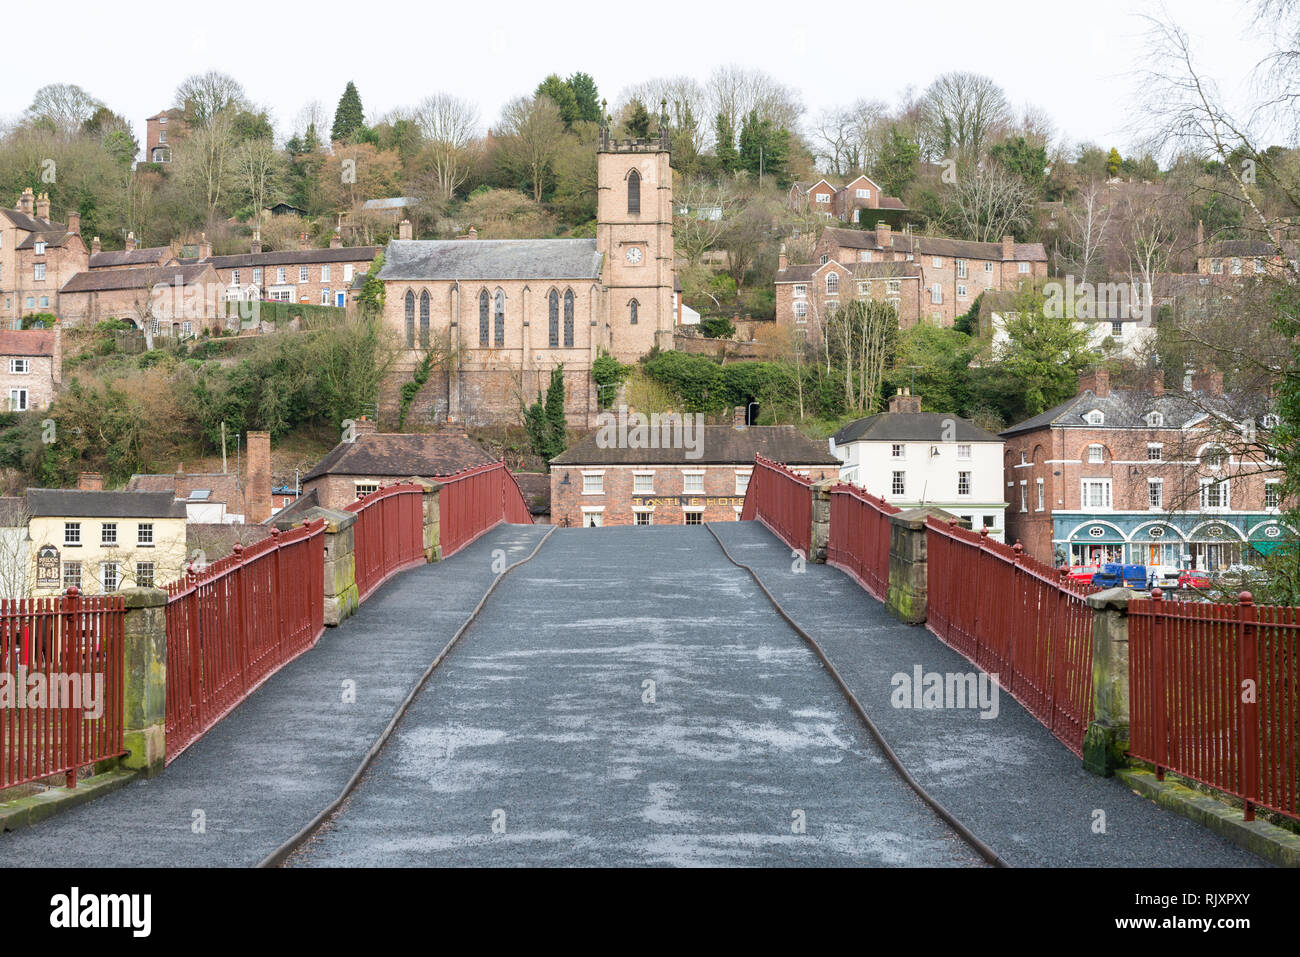 The recently renovated and painted Iron Bridge at Ironbridge, Telford, Shropshire - Stock Image